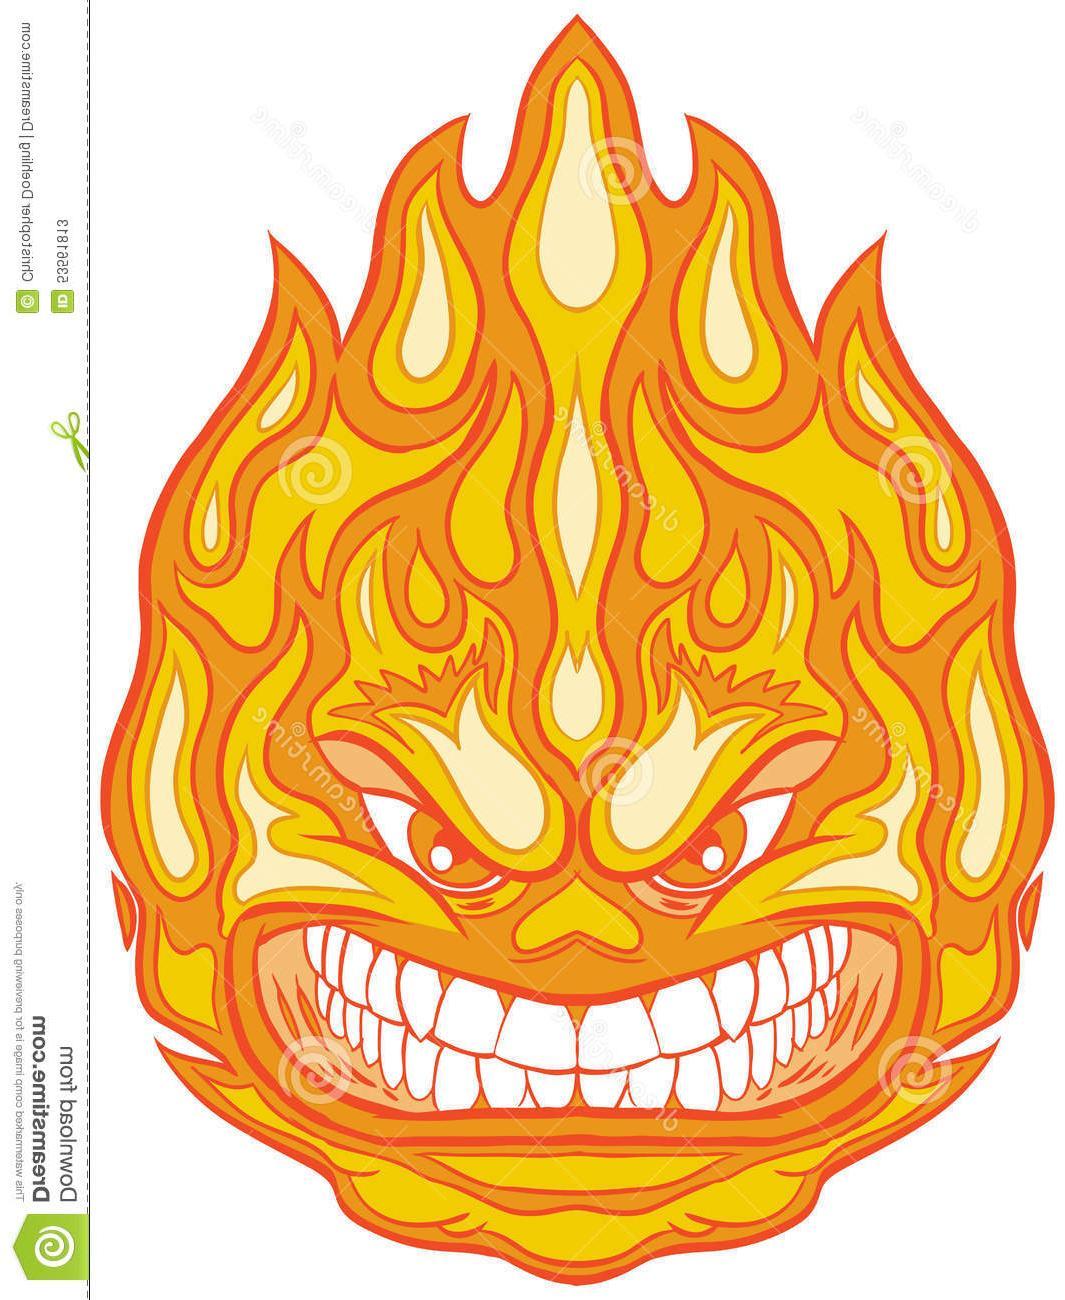 1065x1300 Hd Angry Face Fireball Vector Clip Art Cartoon Illustration Mascot